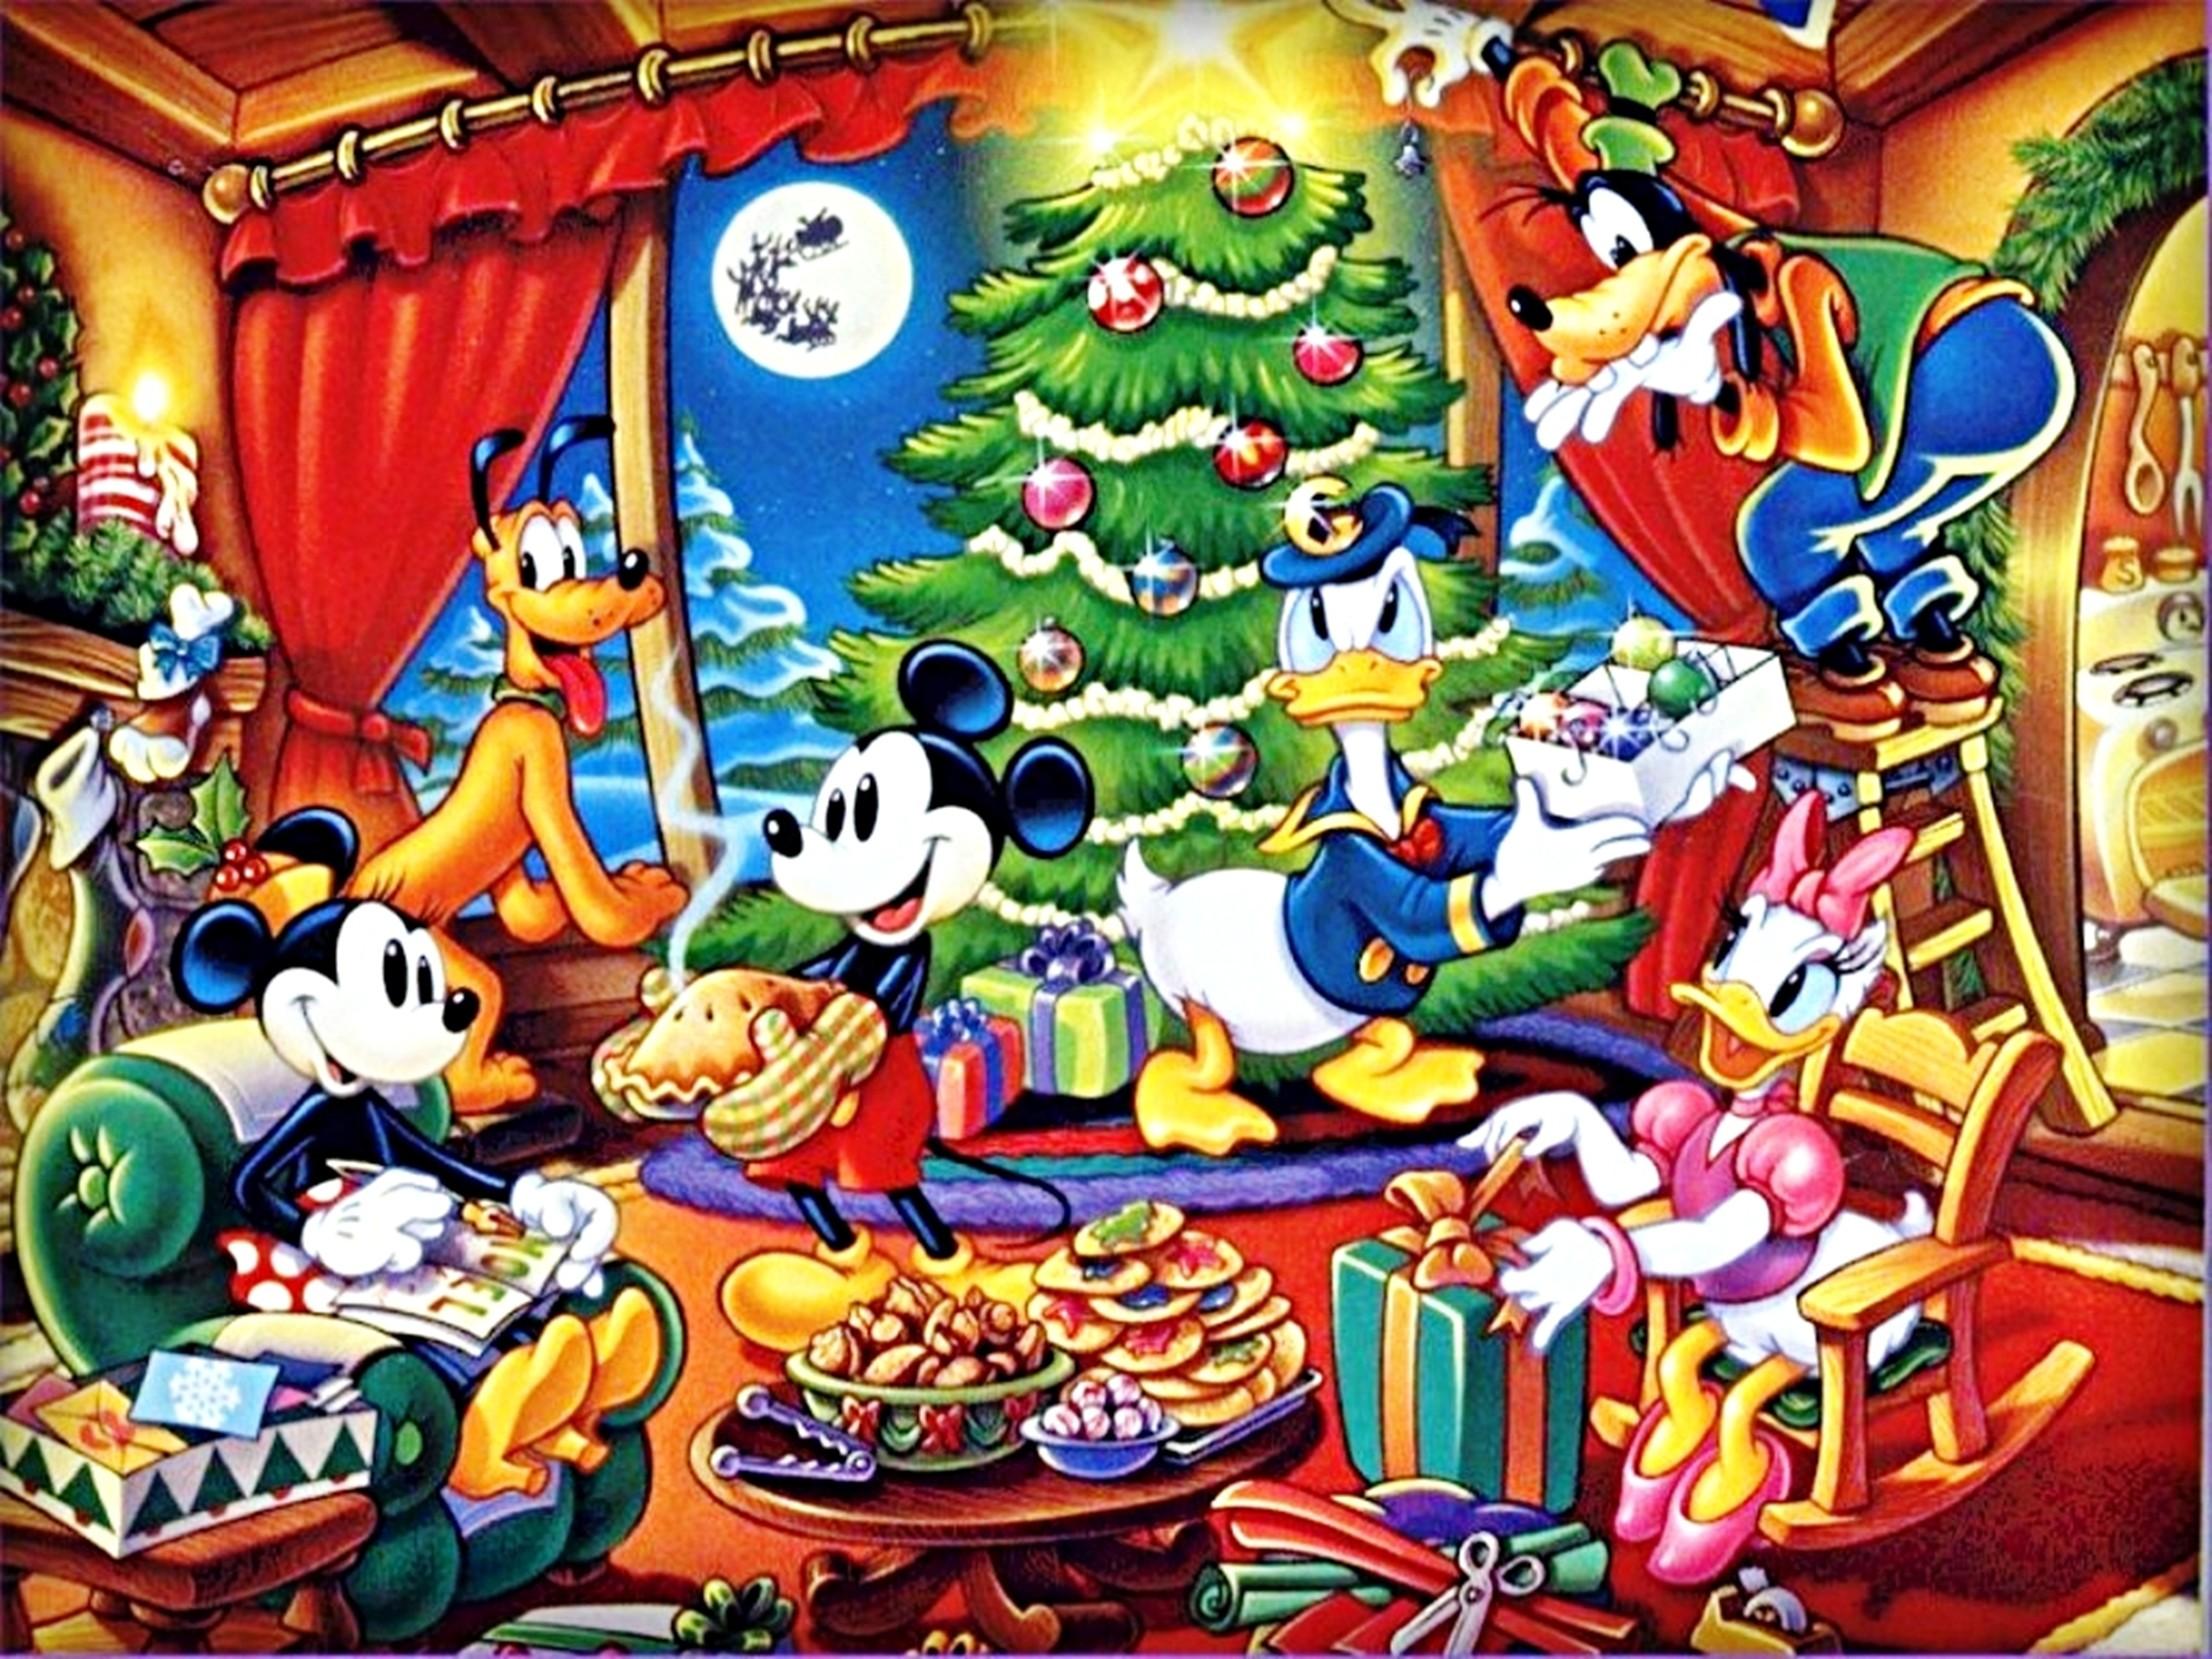 Res: 2212x1659, Walt Disney Characters Walt Disney Wallpapers The Disney Gang